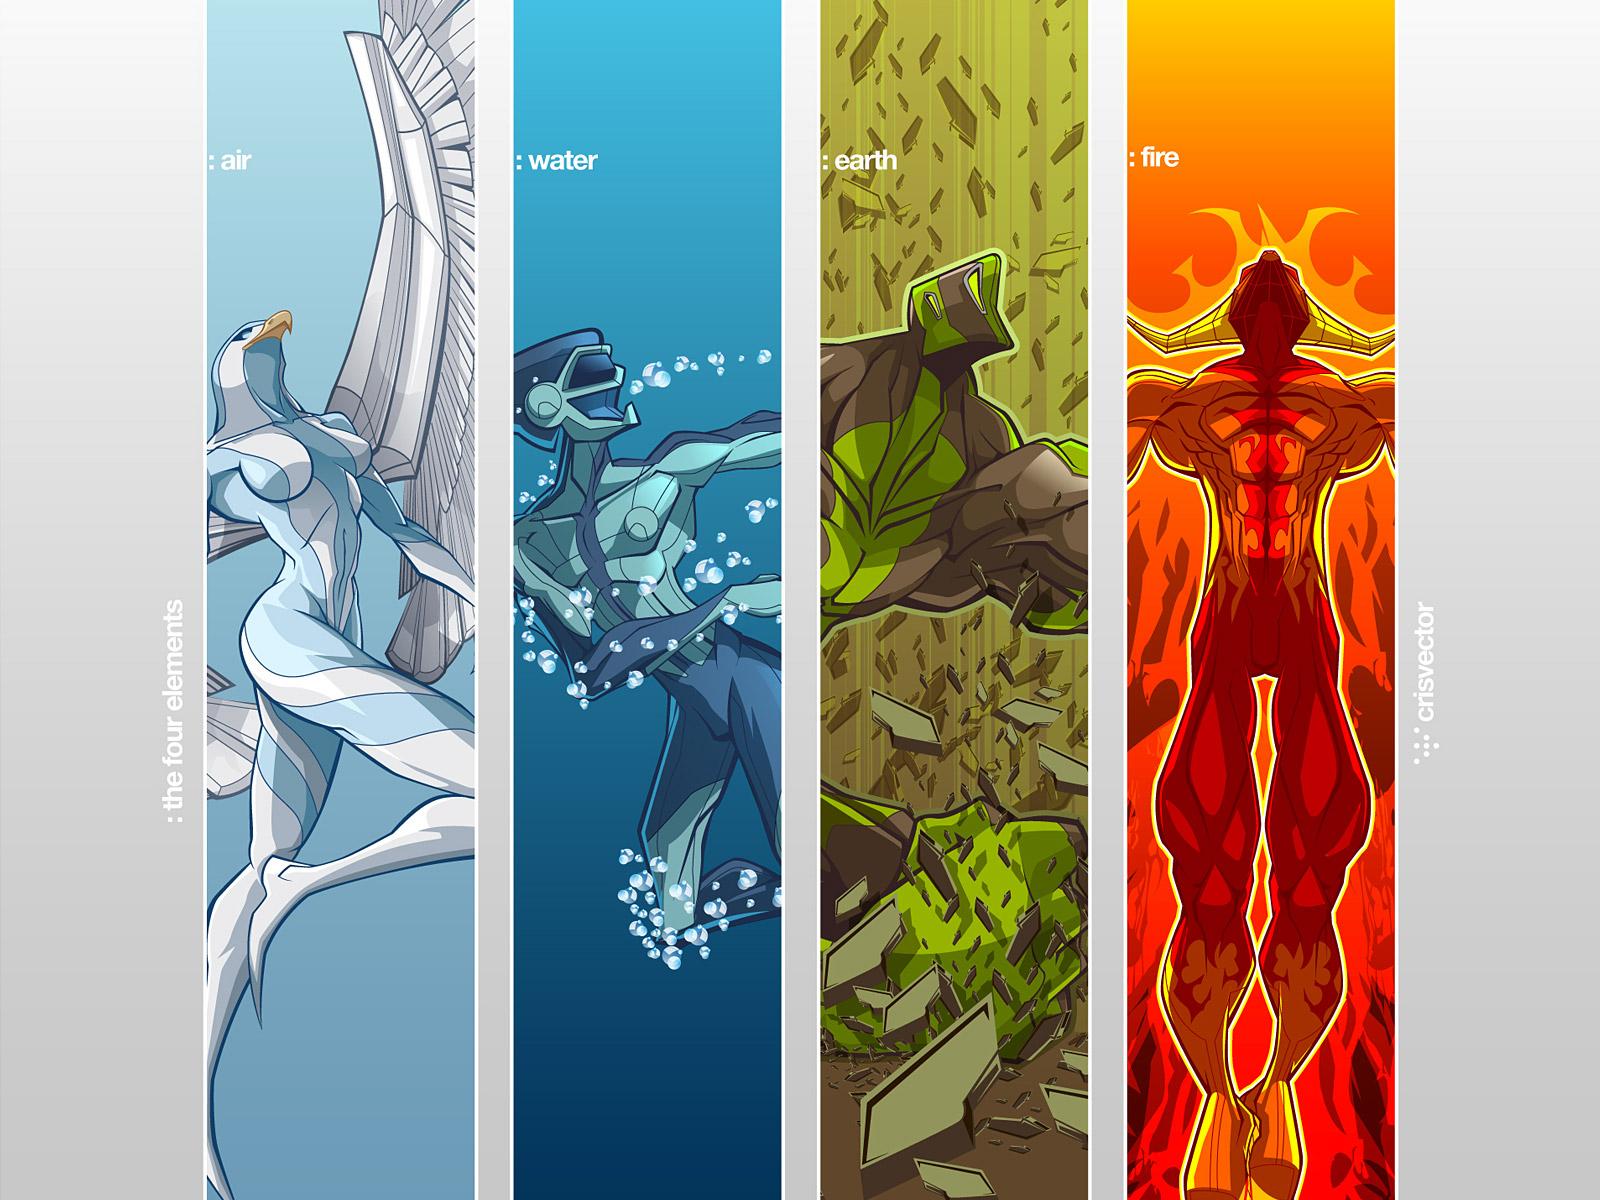 Spirit Musings: Elementals